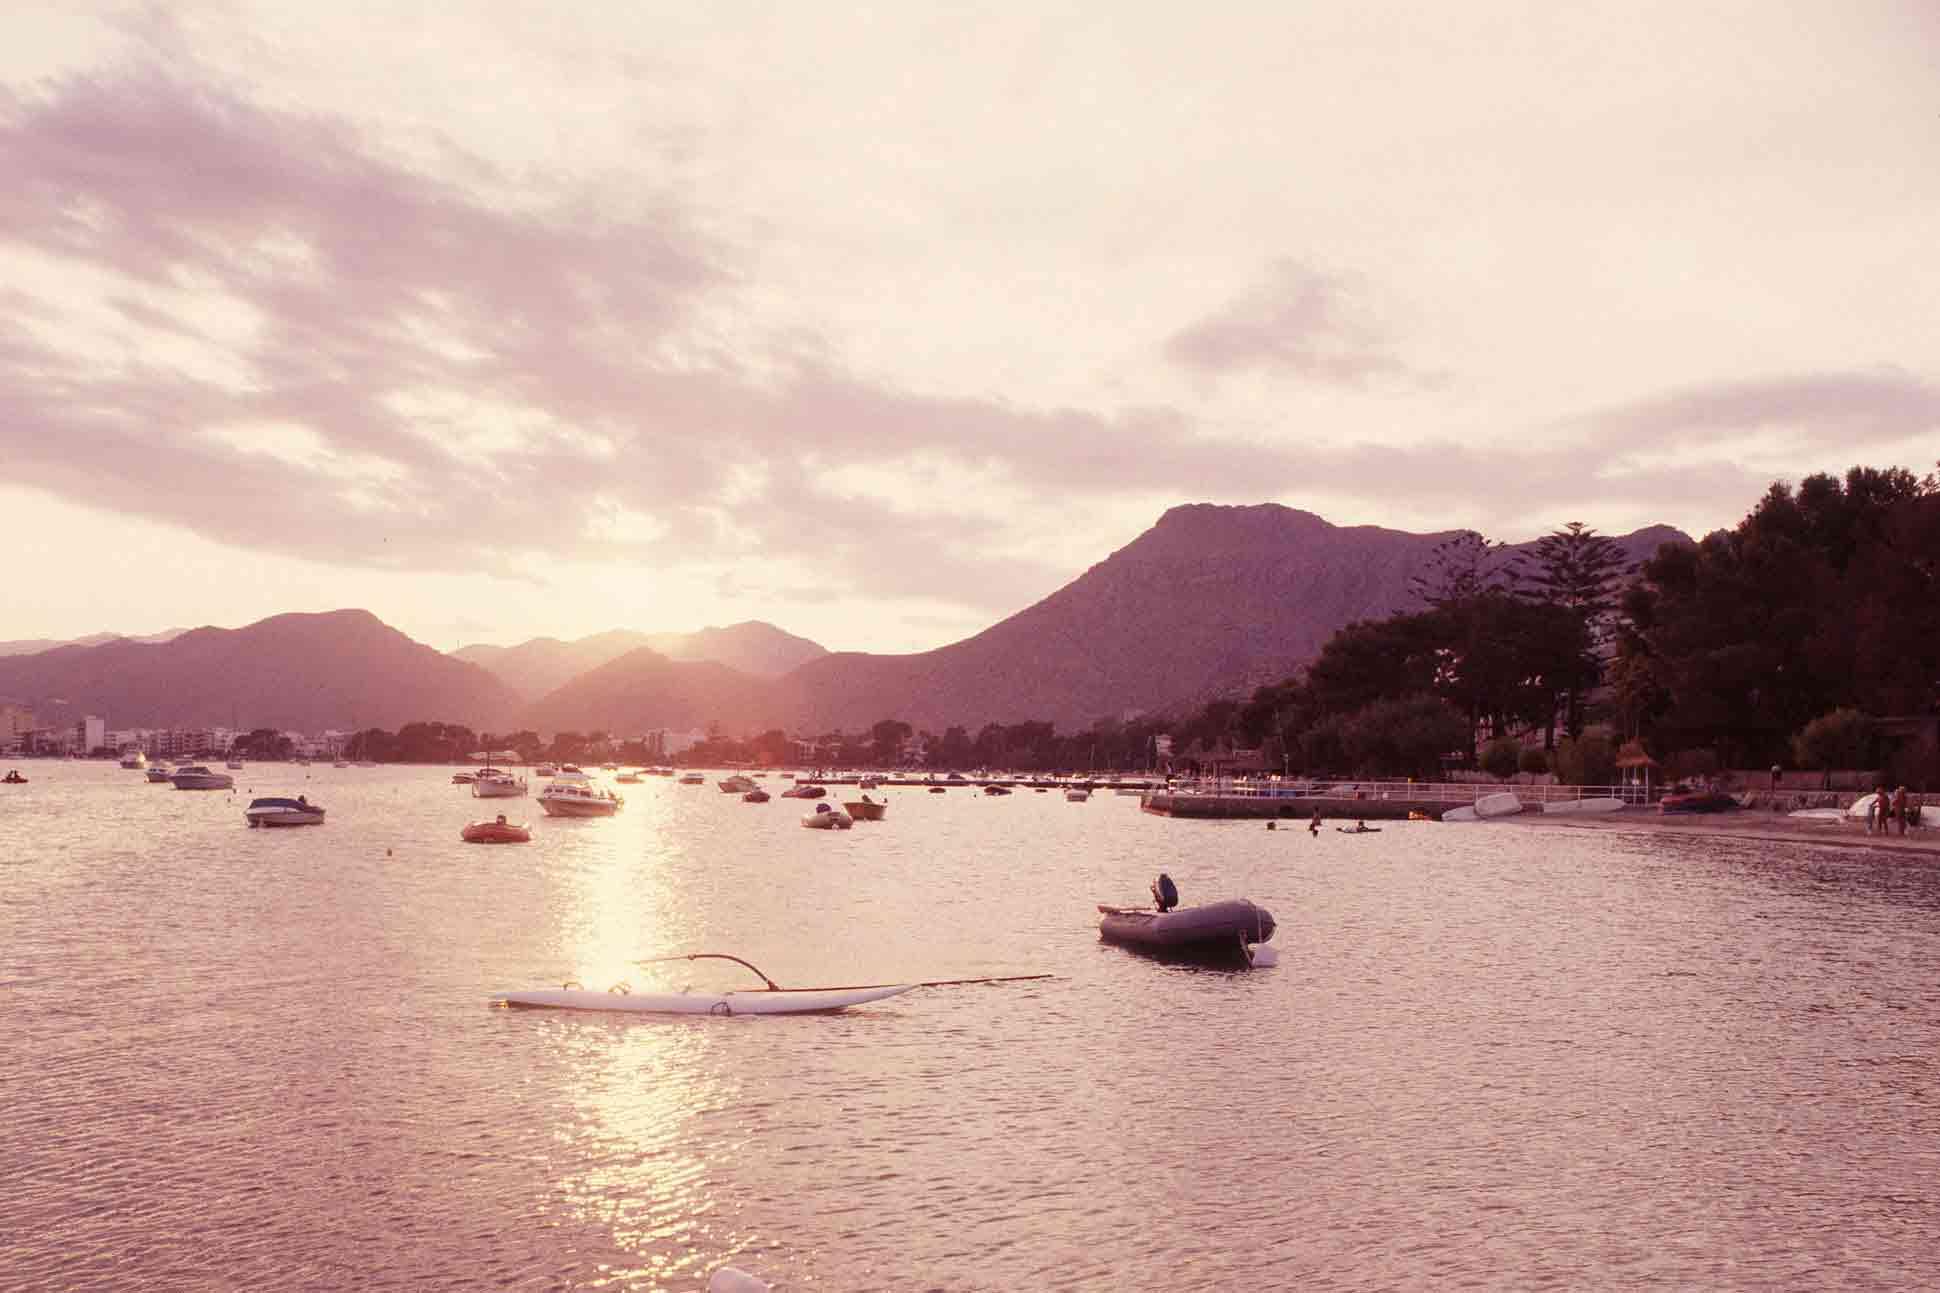 Pollensa Bay, Mallorca. Photography by Manuela Munoz, courtesy of Illes Balears